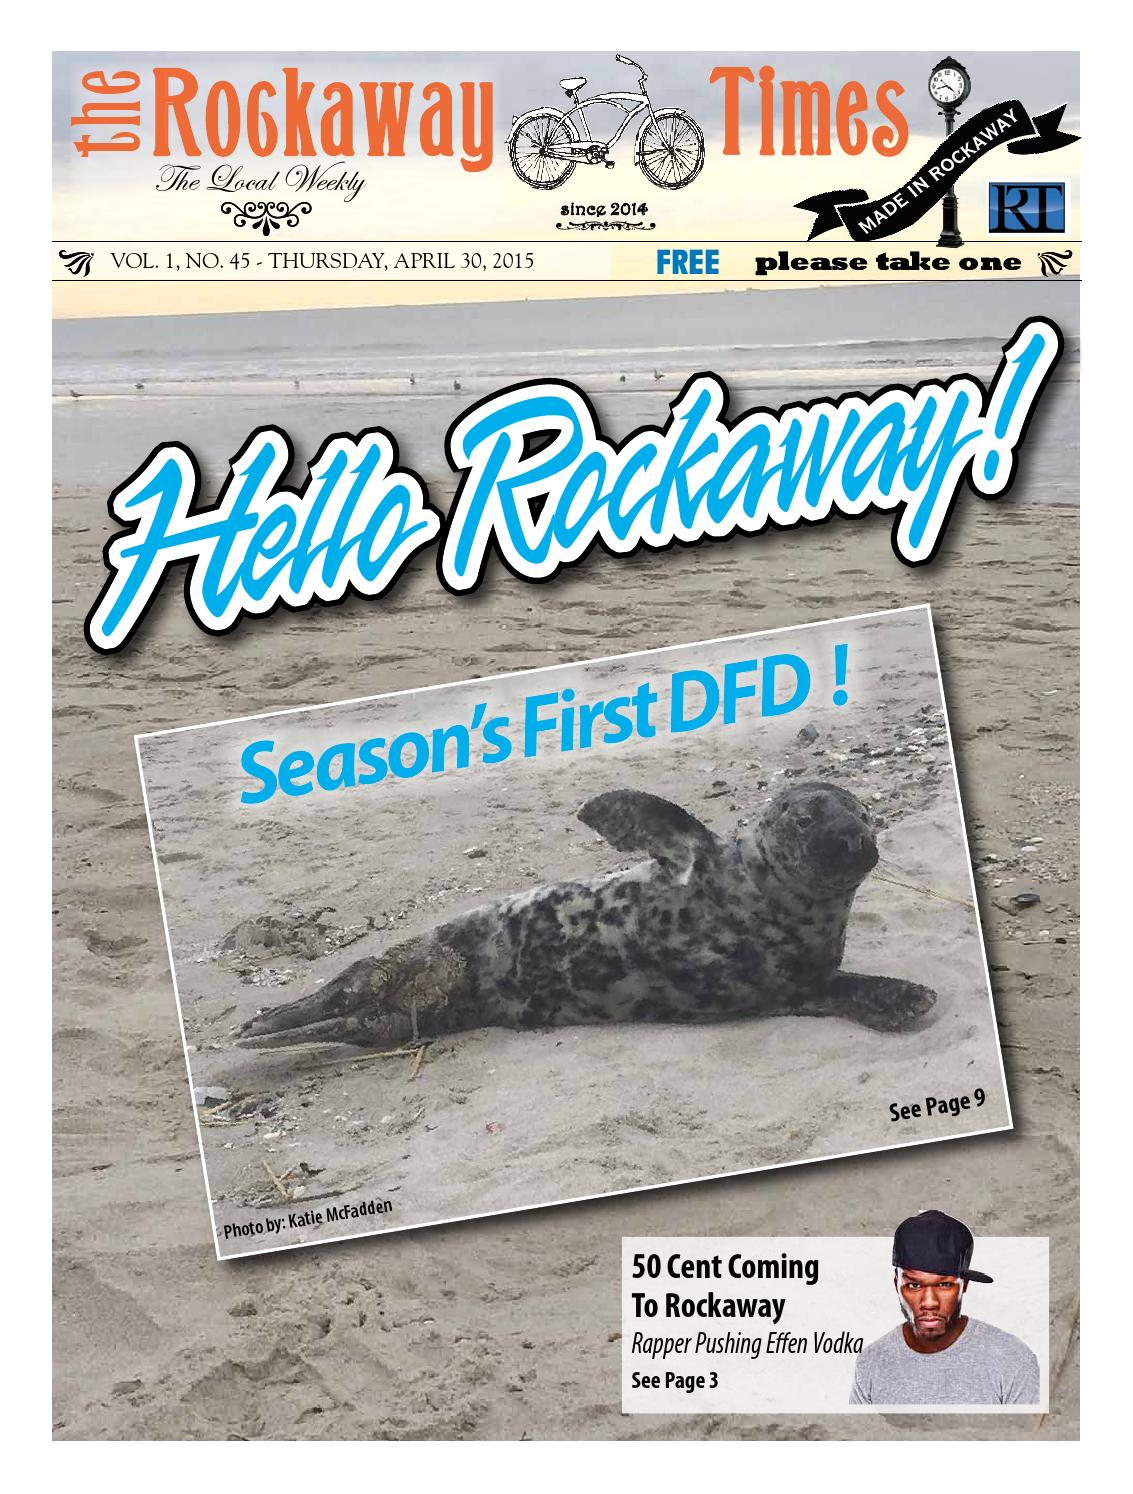 Rockaway Times 4 30 15 by Rockaway Times - issuu